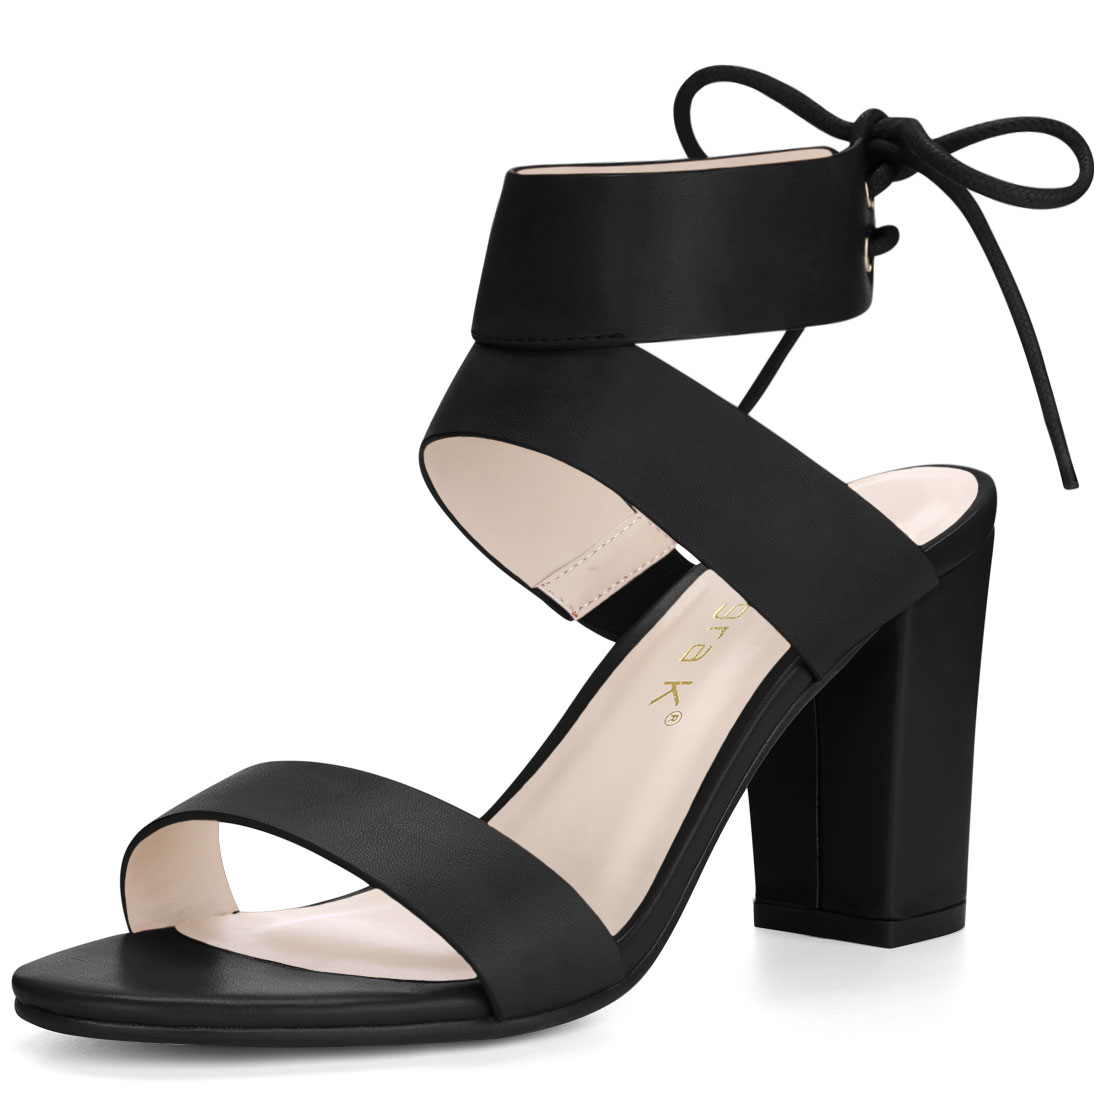 Women Open Toe Lace Up Back High Block Heel Sandals Black US 6